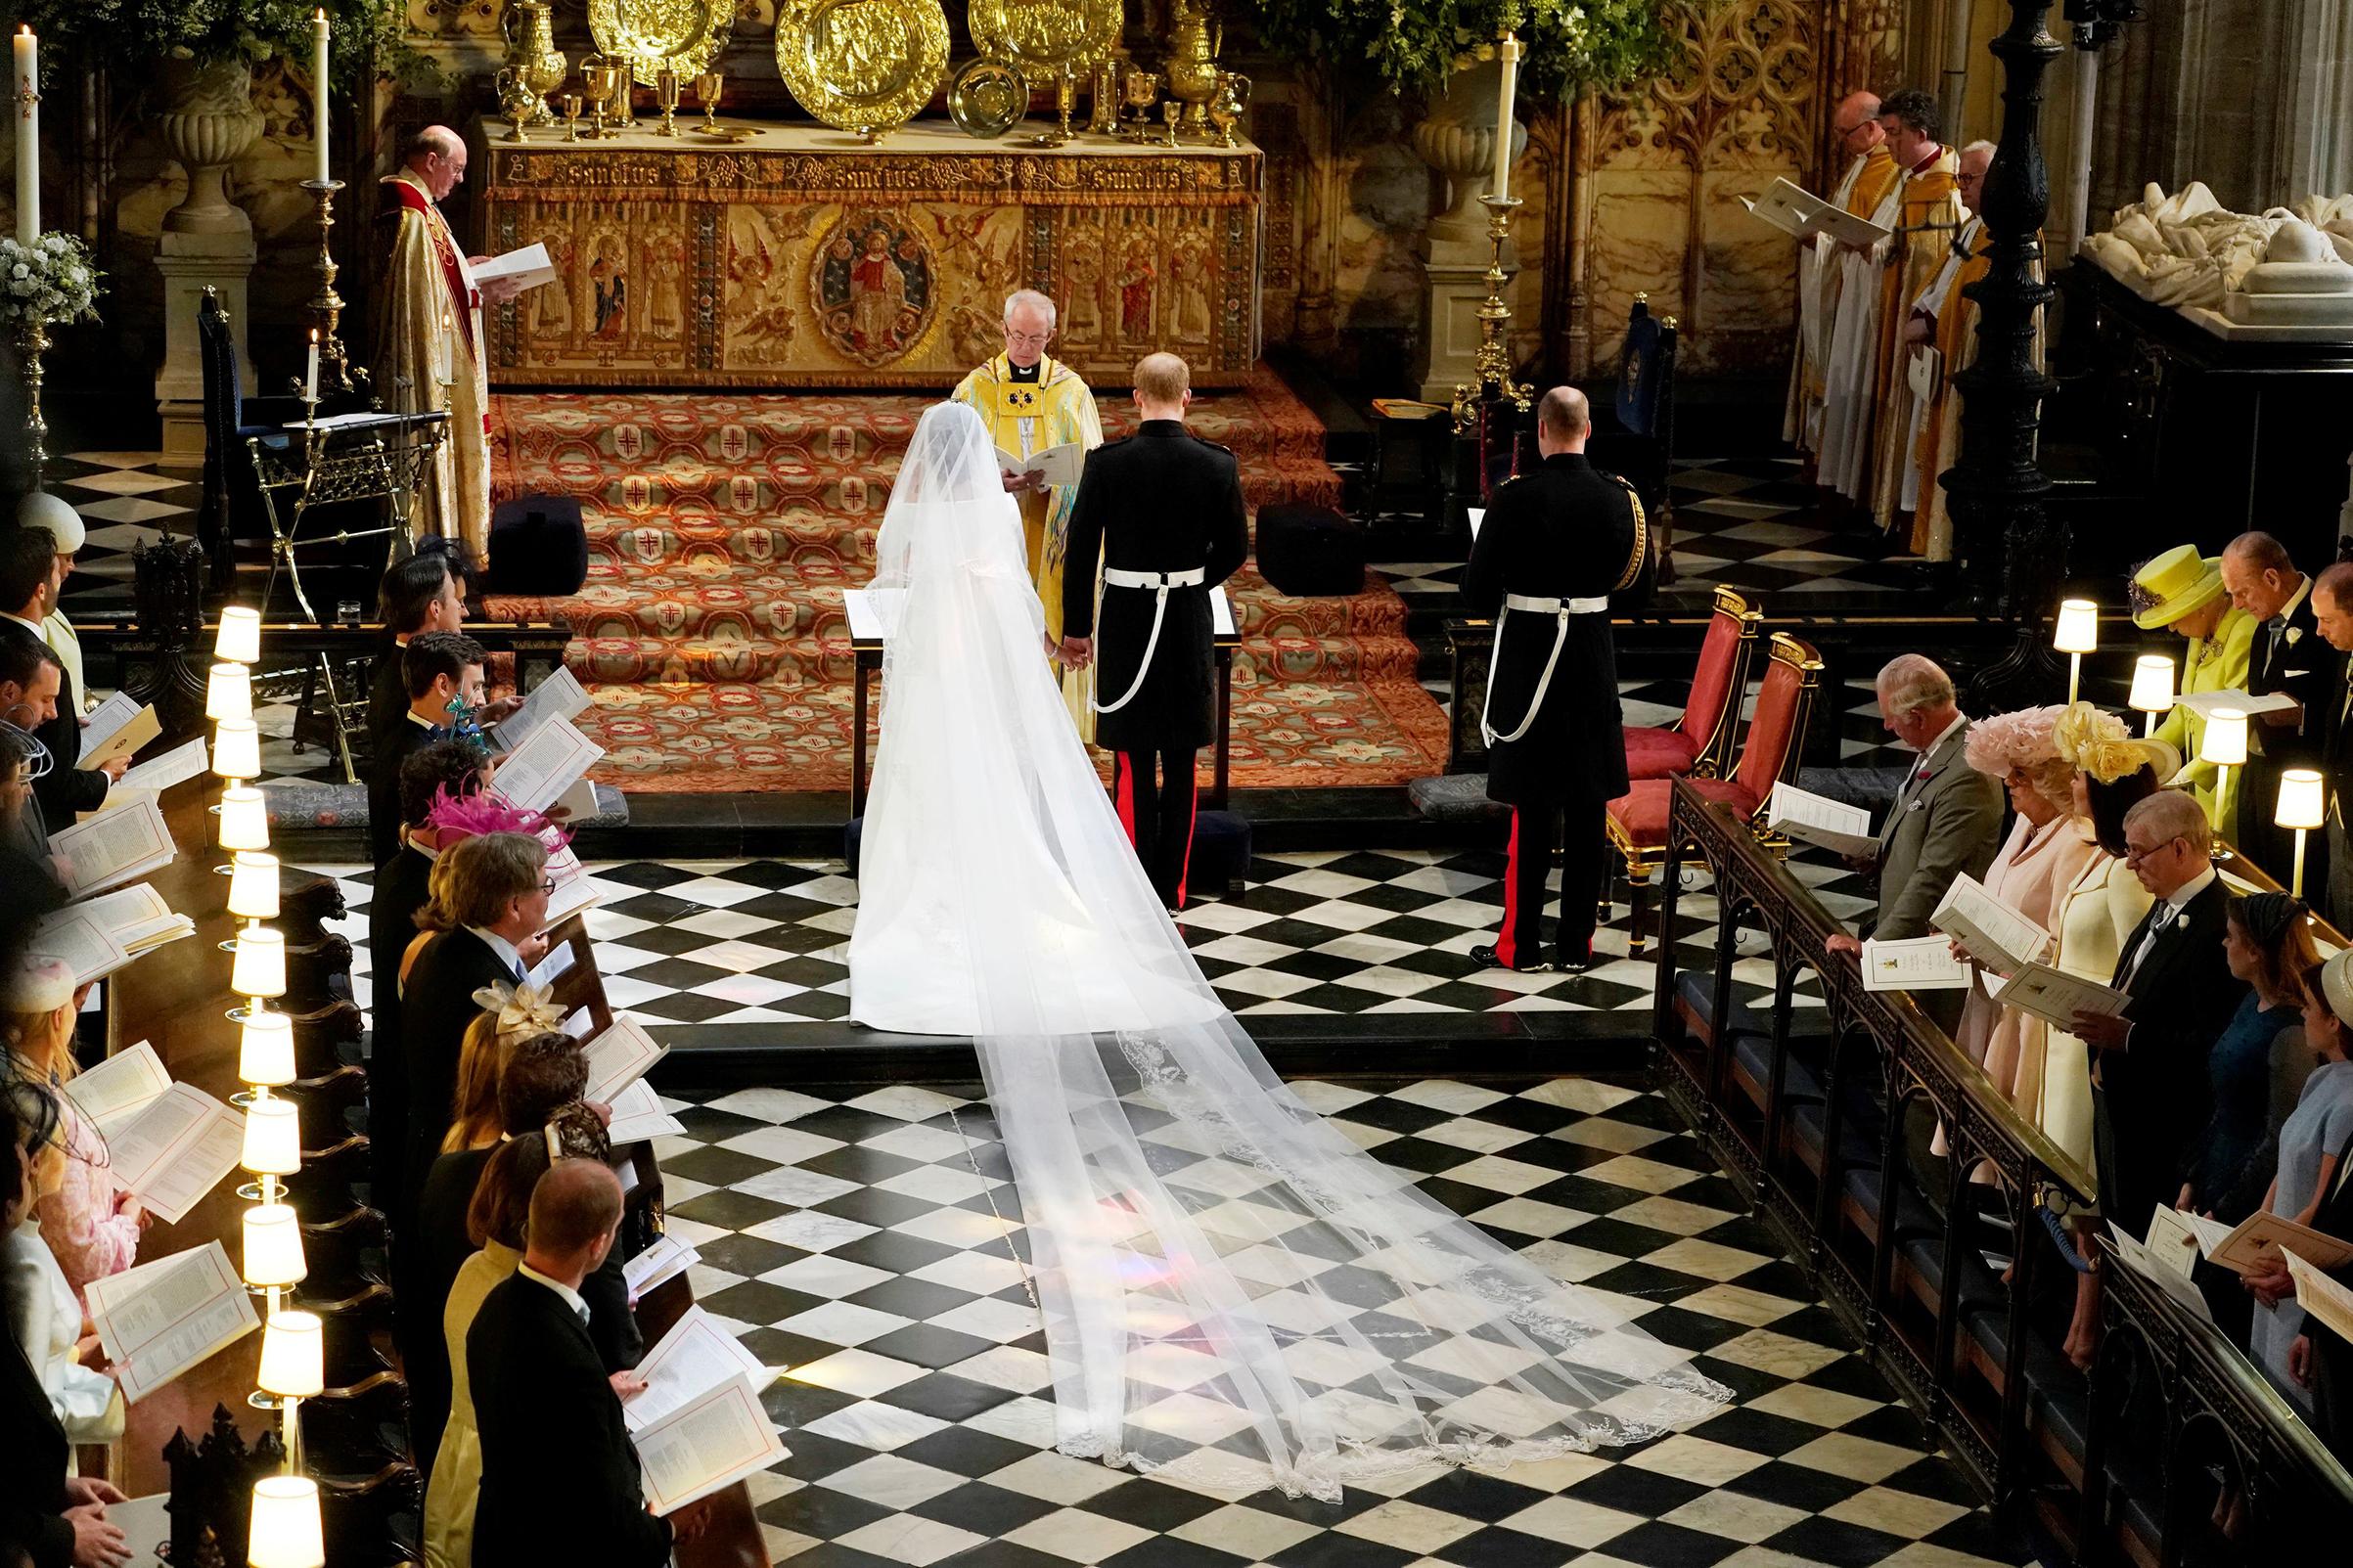 PRINCE HARRY & MEGHAN MARKLE'S FIRST WEDDING ANNIVERSARY   ROYAL WEDDING RECAP